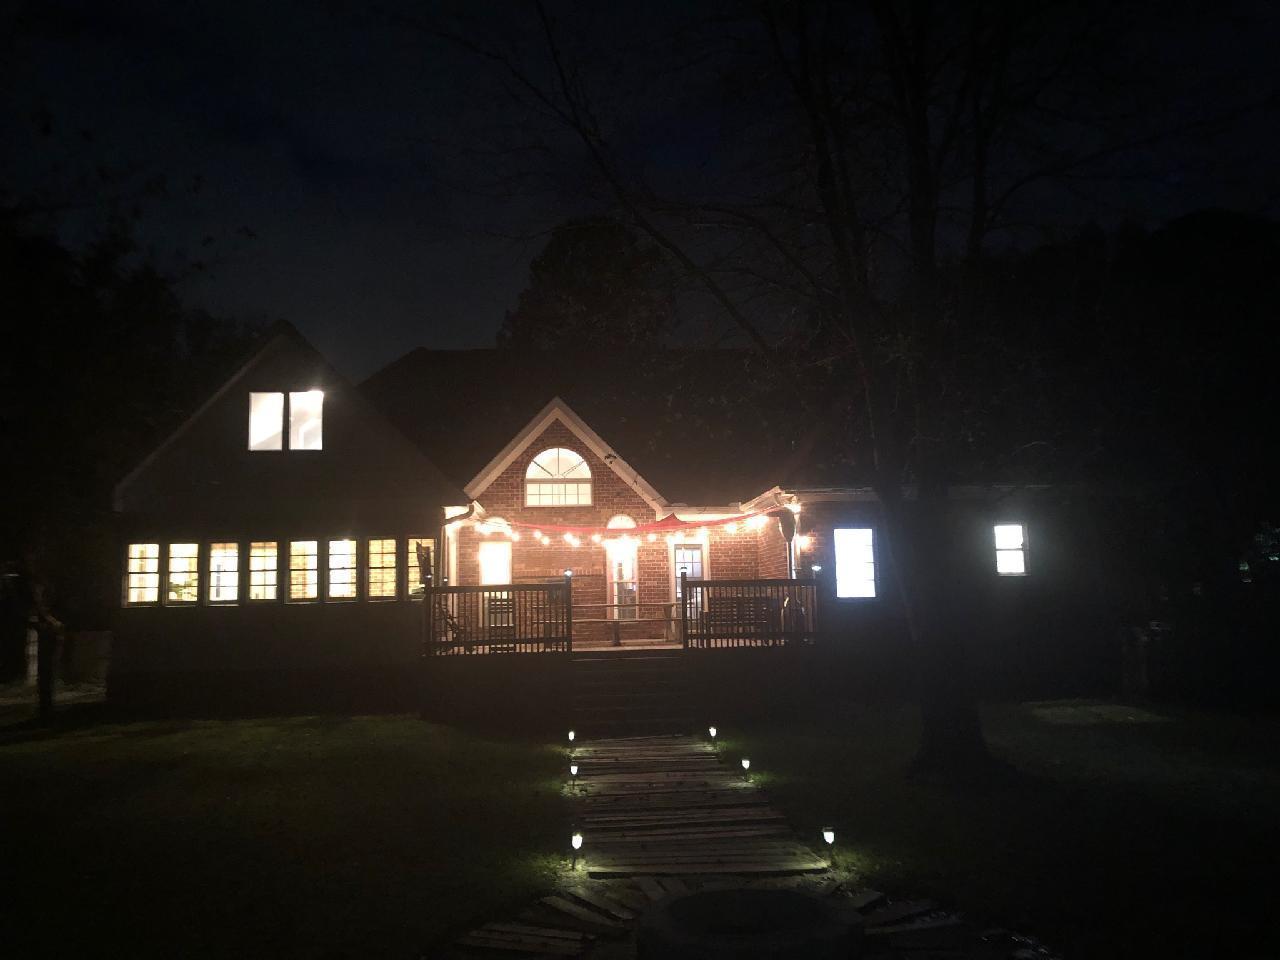 Dunes West Homes For Sale - 3708 Colonel Vanderhorst, Mount Pleasant, SC - 31